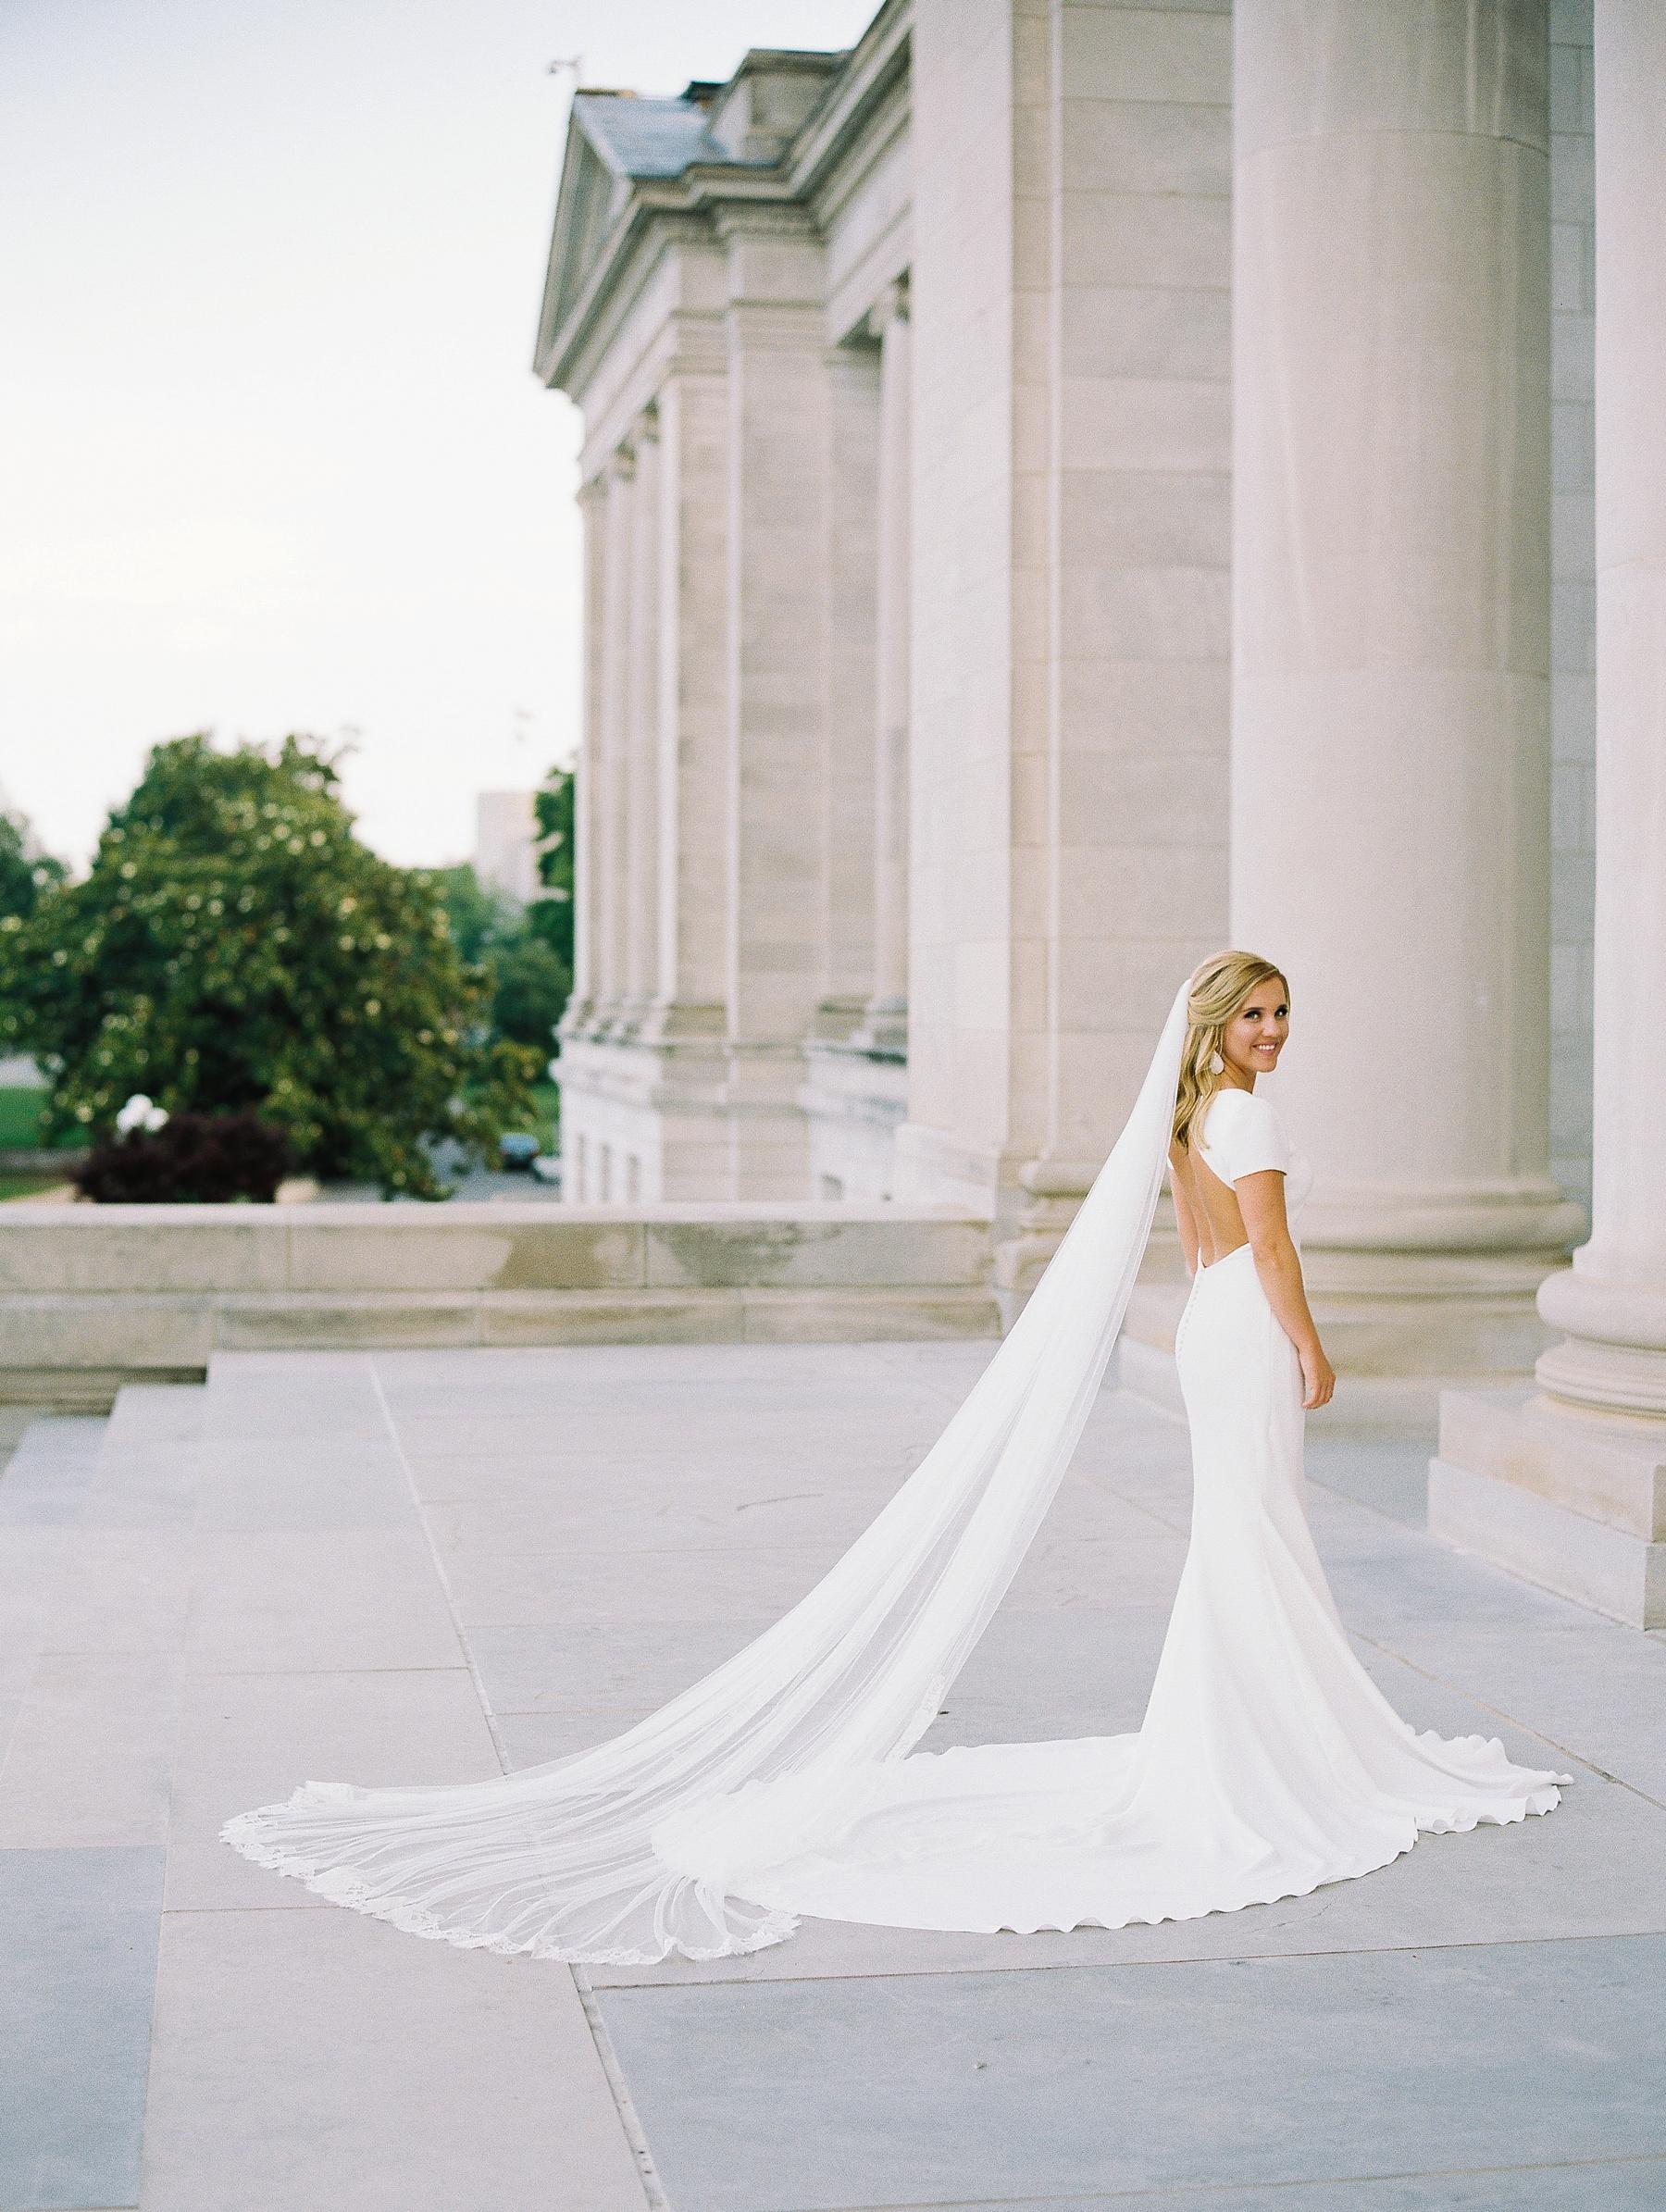 Arkansas Capitol Building Bridals Wedding Photographer_0114.jpg